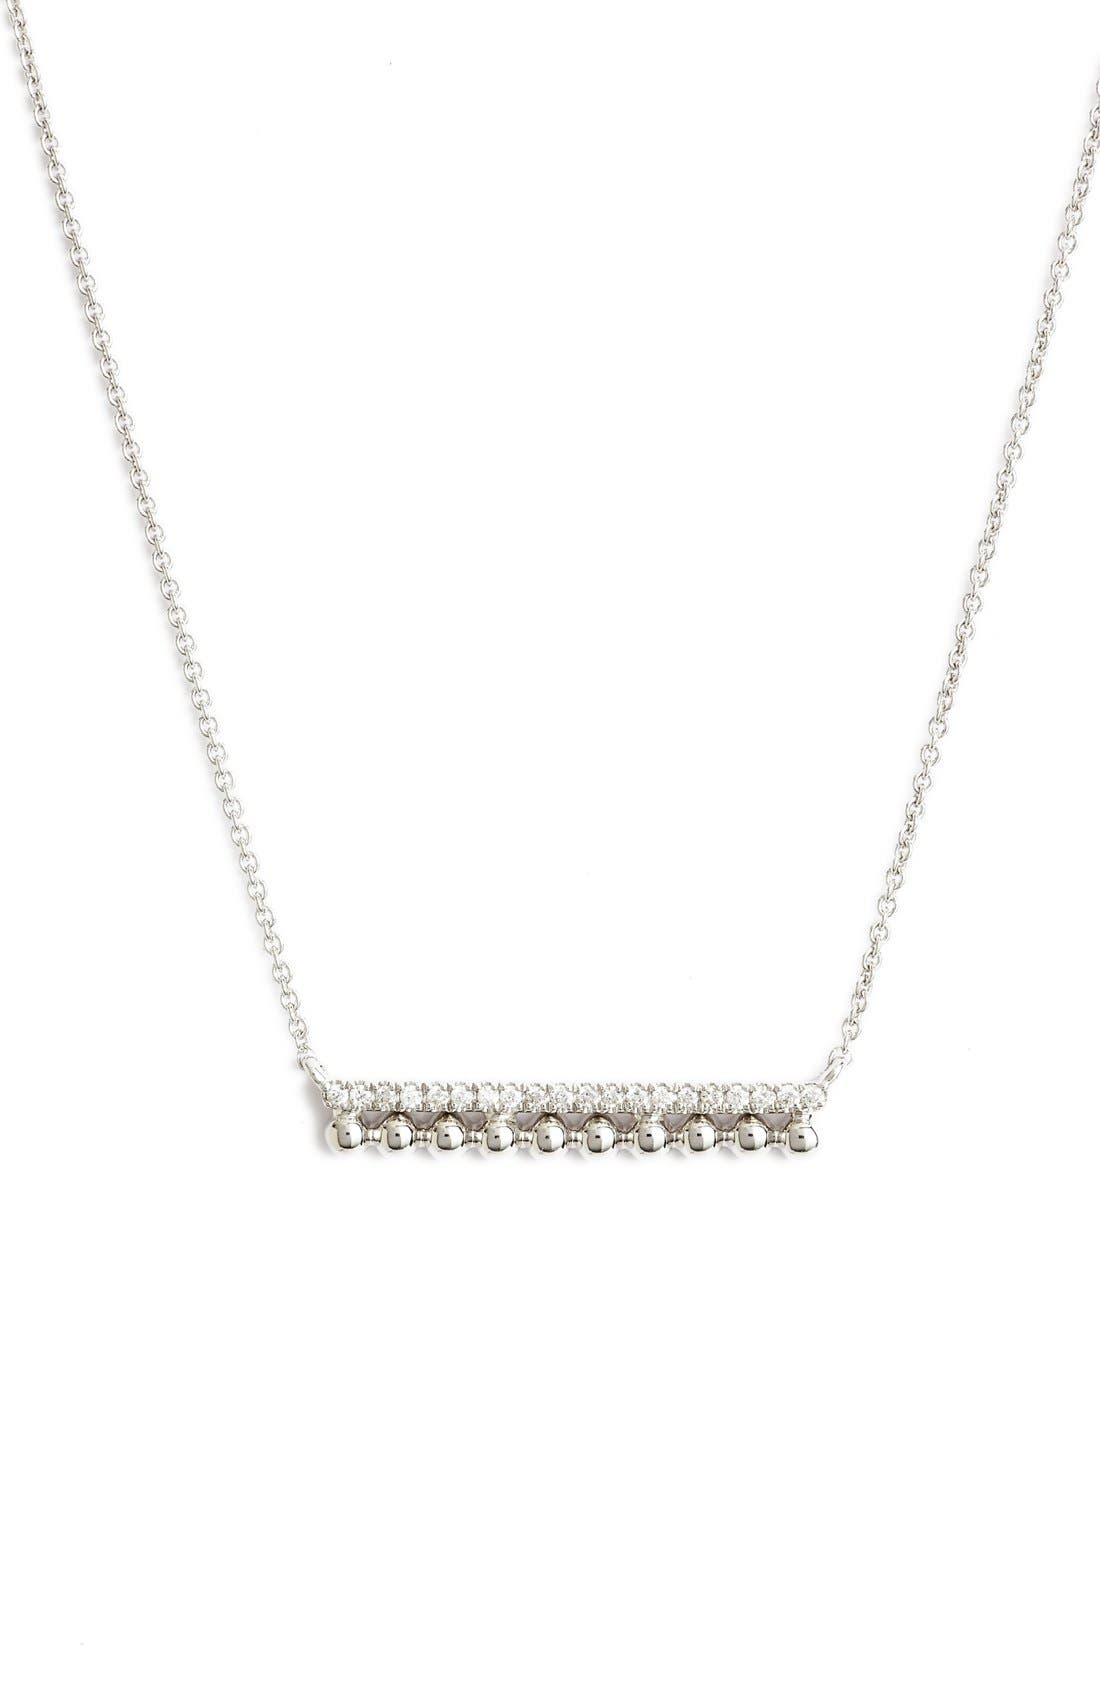 Dana Rebecca Designs 'Poppy Rae' Bar Pendant Necklace